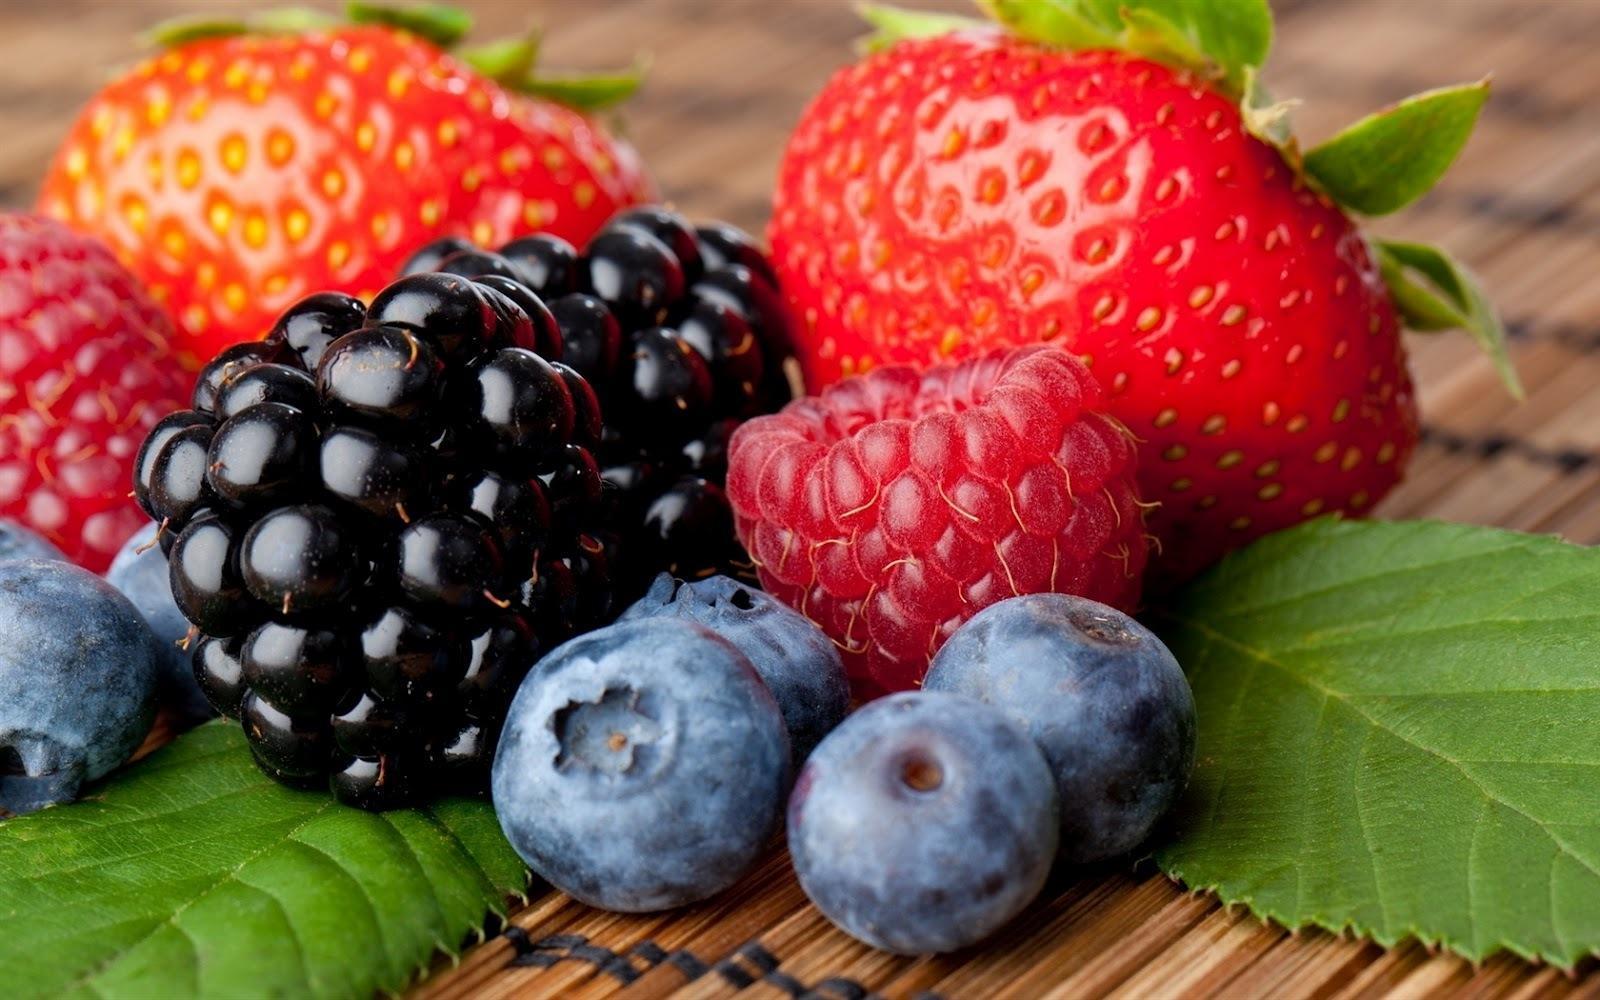 Tabela de Frutas de Baixas Calorias